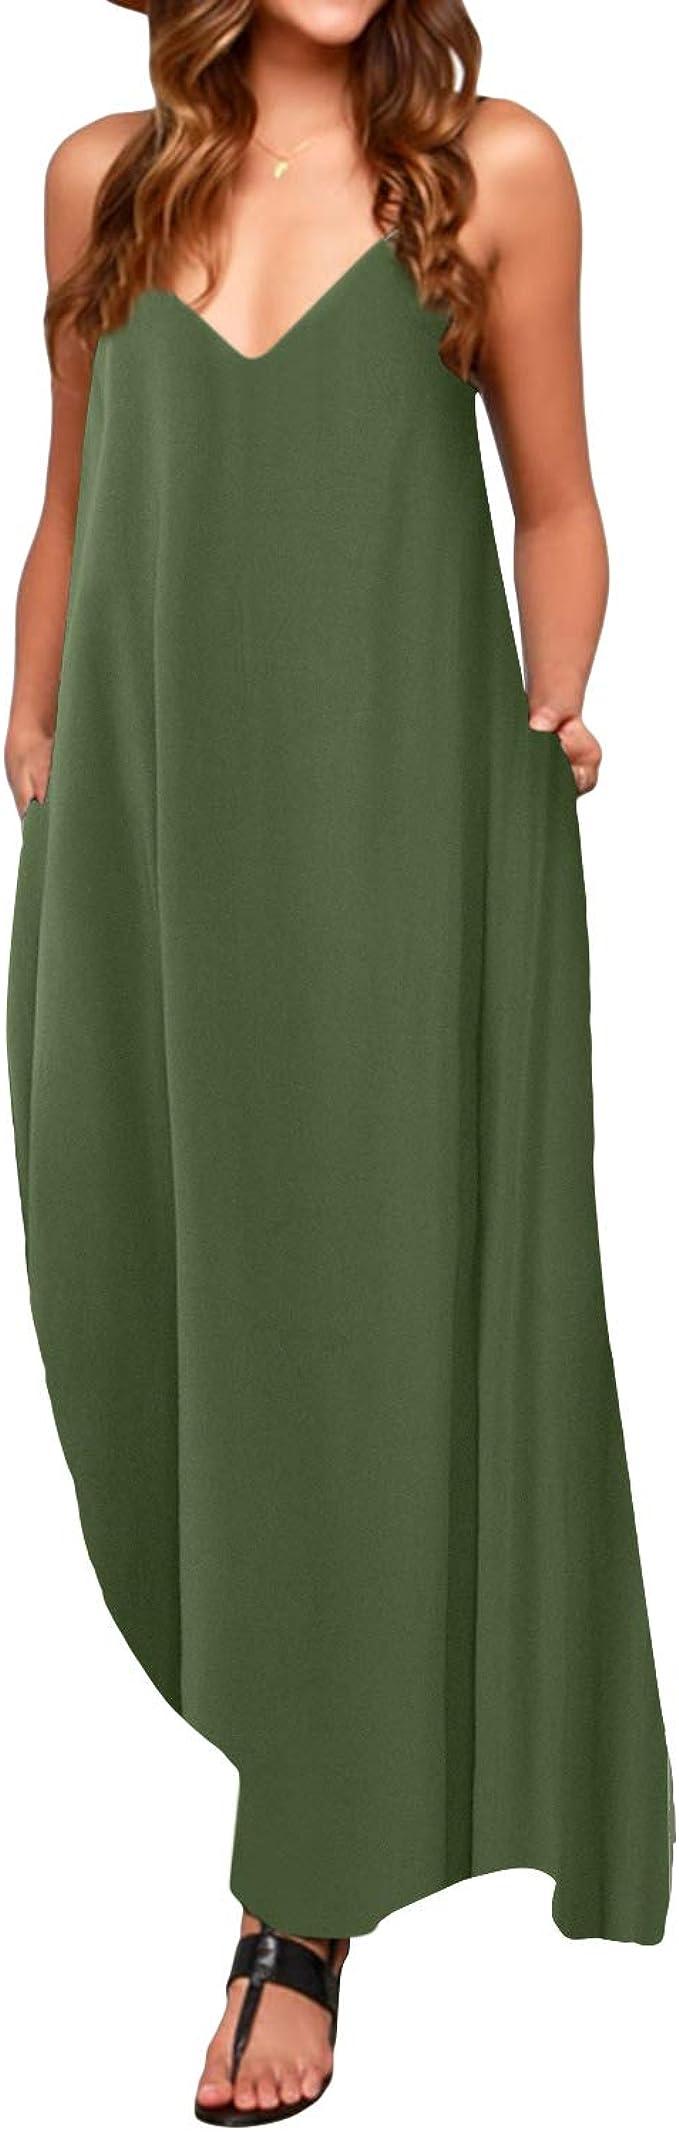 TALLA XL. ACHIOOWA Mujer Vestido Elegante Casual Dress Cuello V Sin Manga Playa Tirantes Bolsillos Punto Falda Larga Verde XL